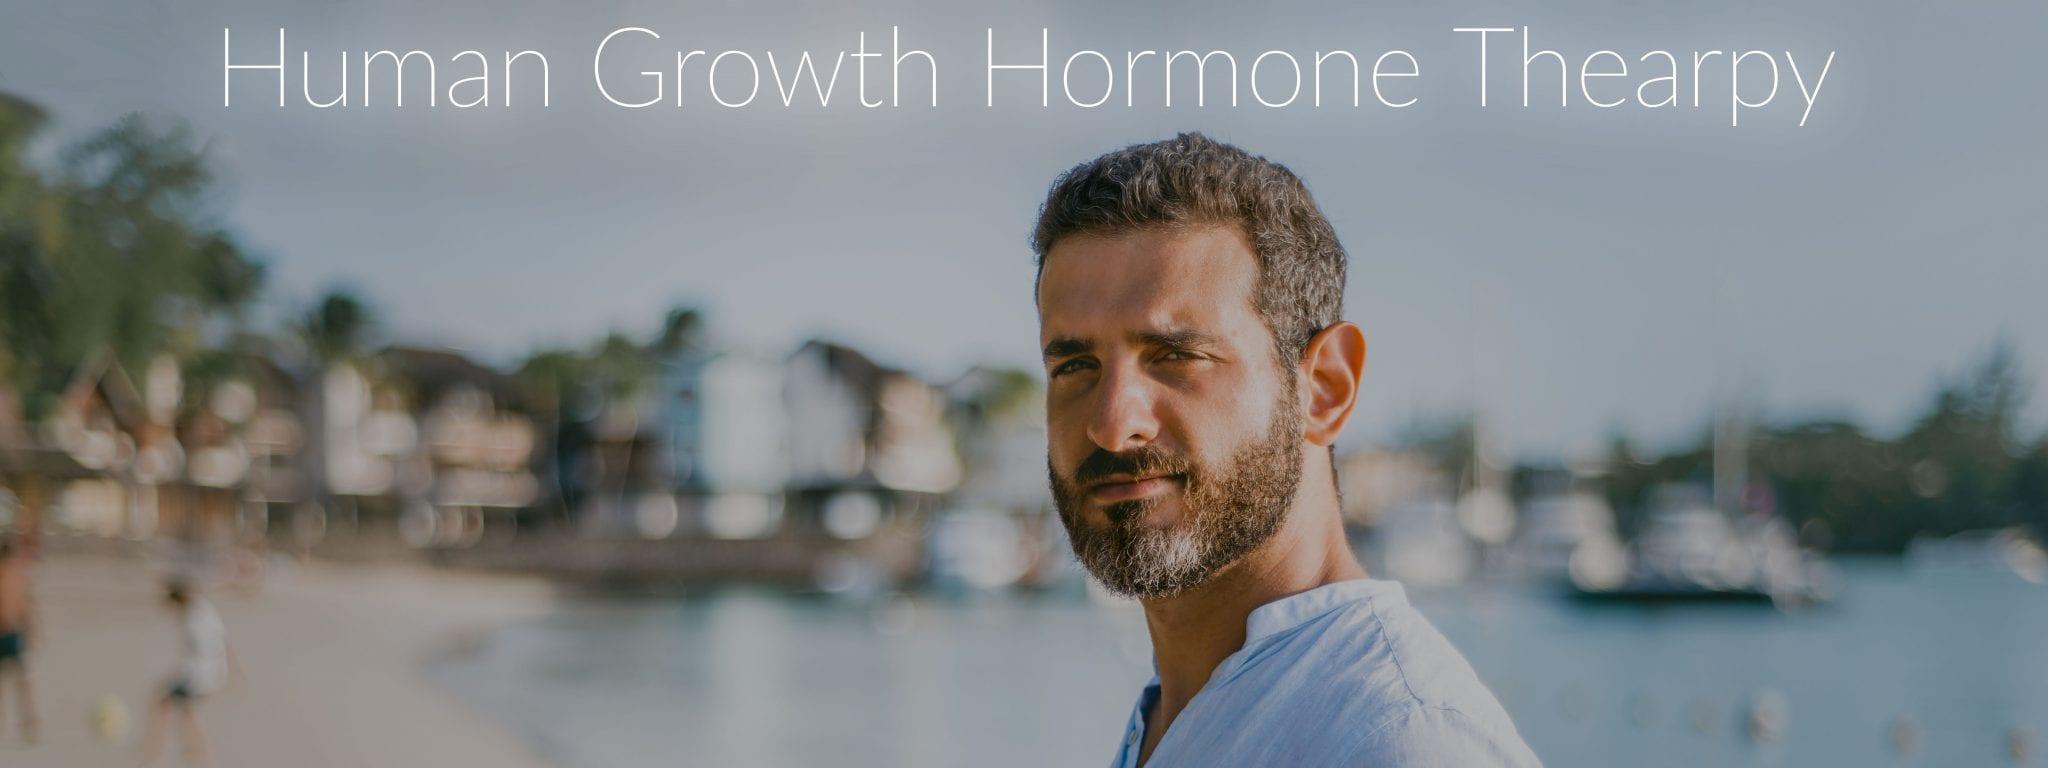 Human Growth Hormone Therapy | OptimalHealthMD